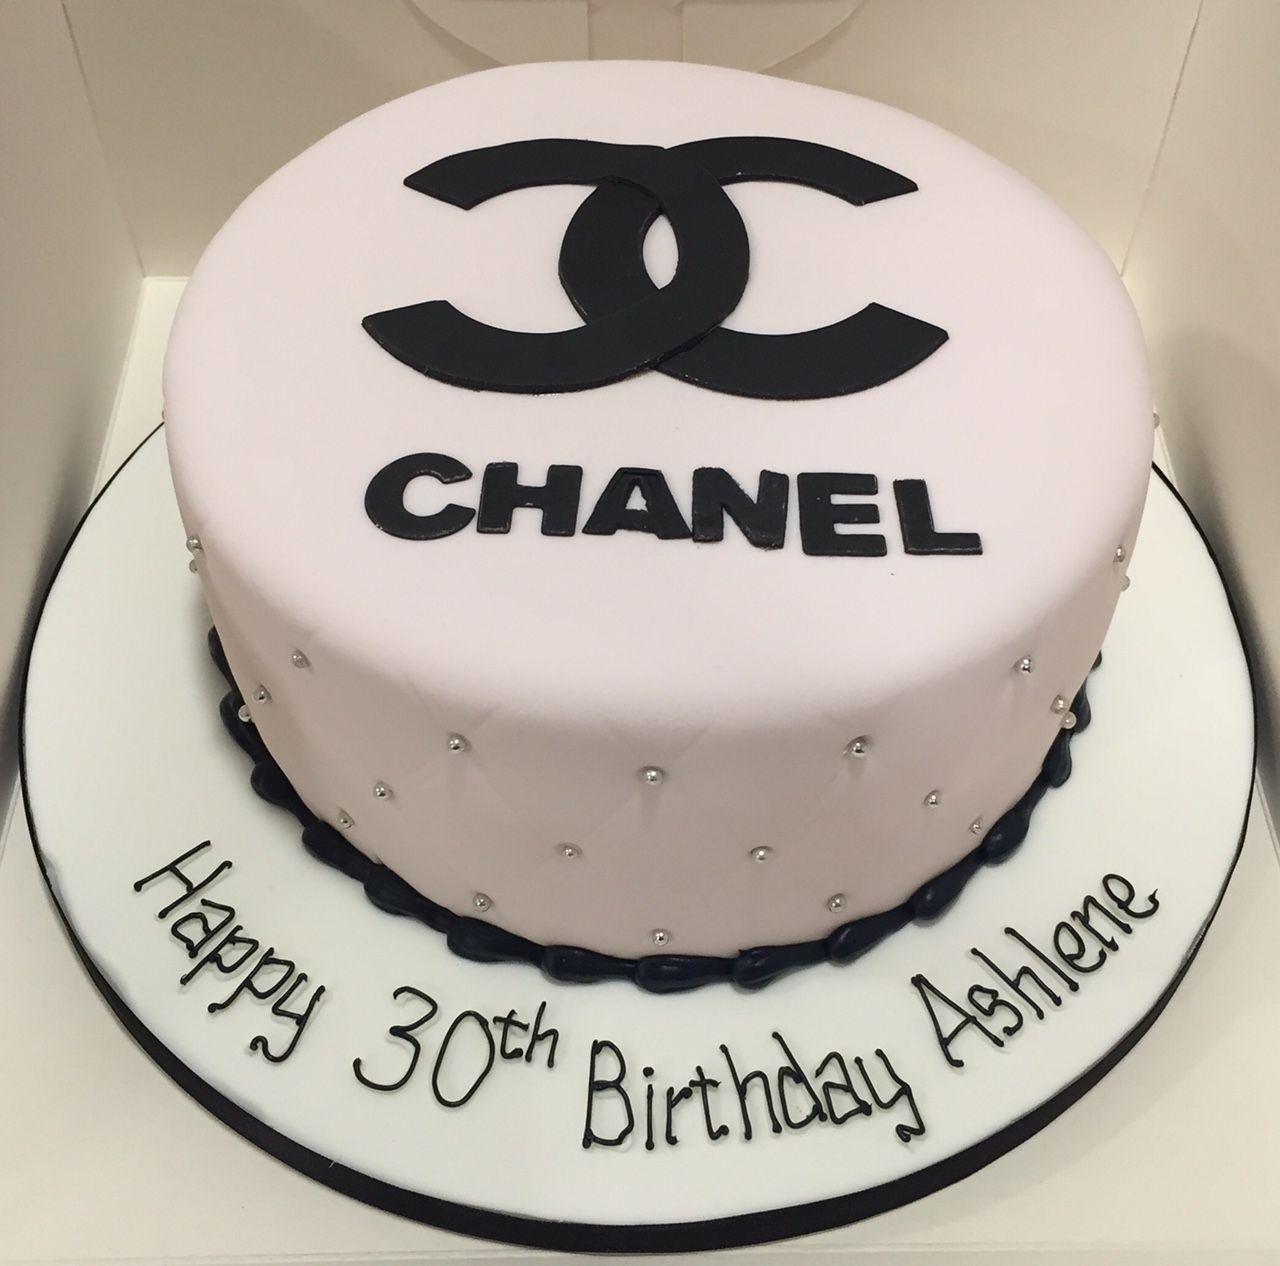 Chanel Logo Cake In 2019 Chanel Birthday Cake Chanel